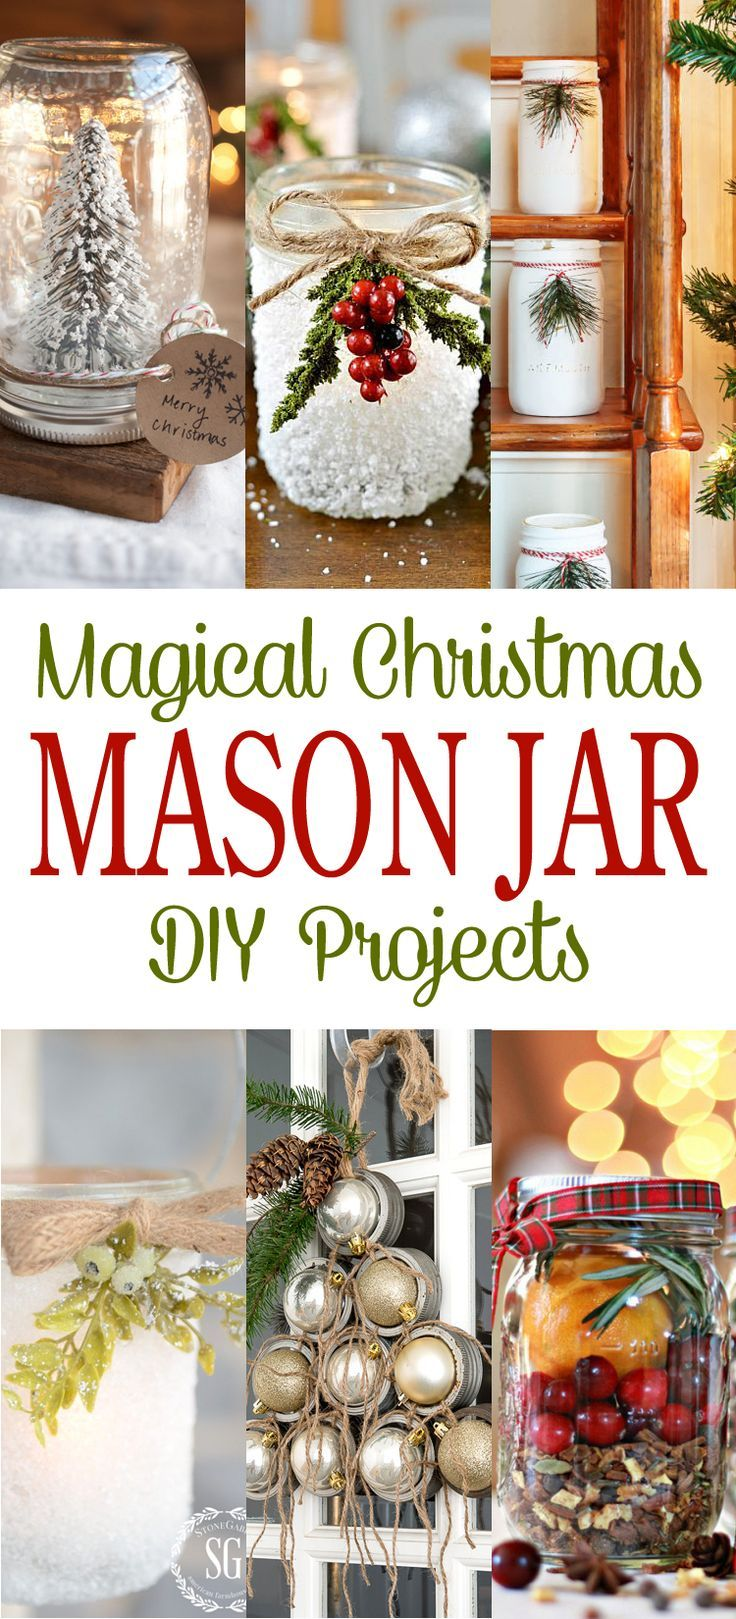 Magical Christmas Mason Jar Diy Projects The Cottage Market Christmas Mason Jars Diy Christmas Mason Jars Christmas Jars